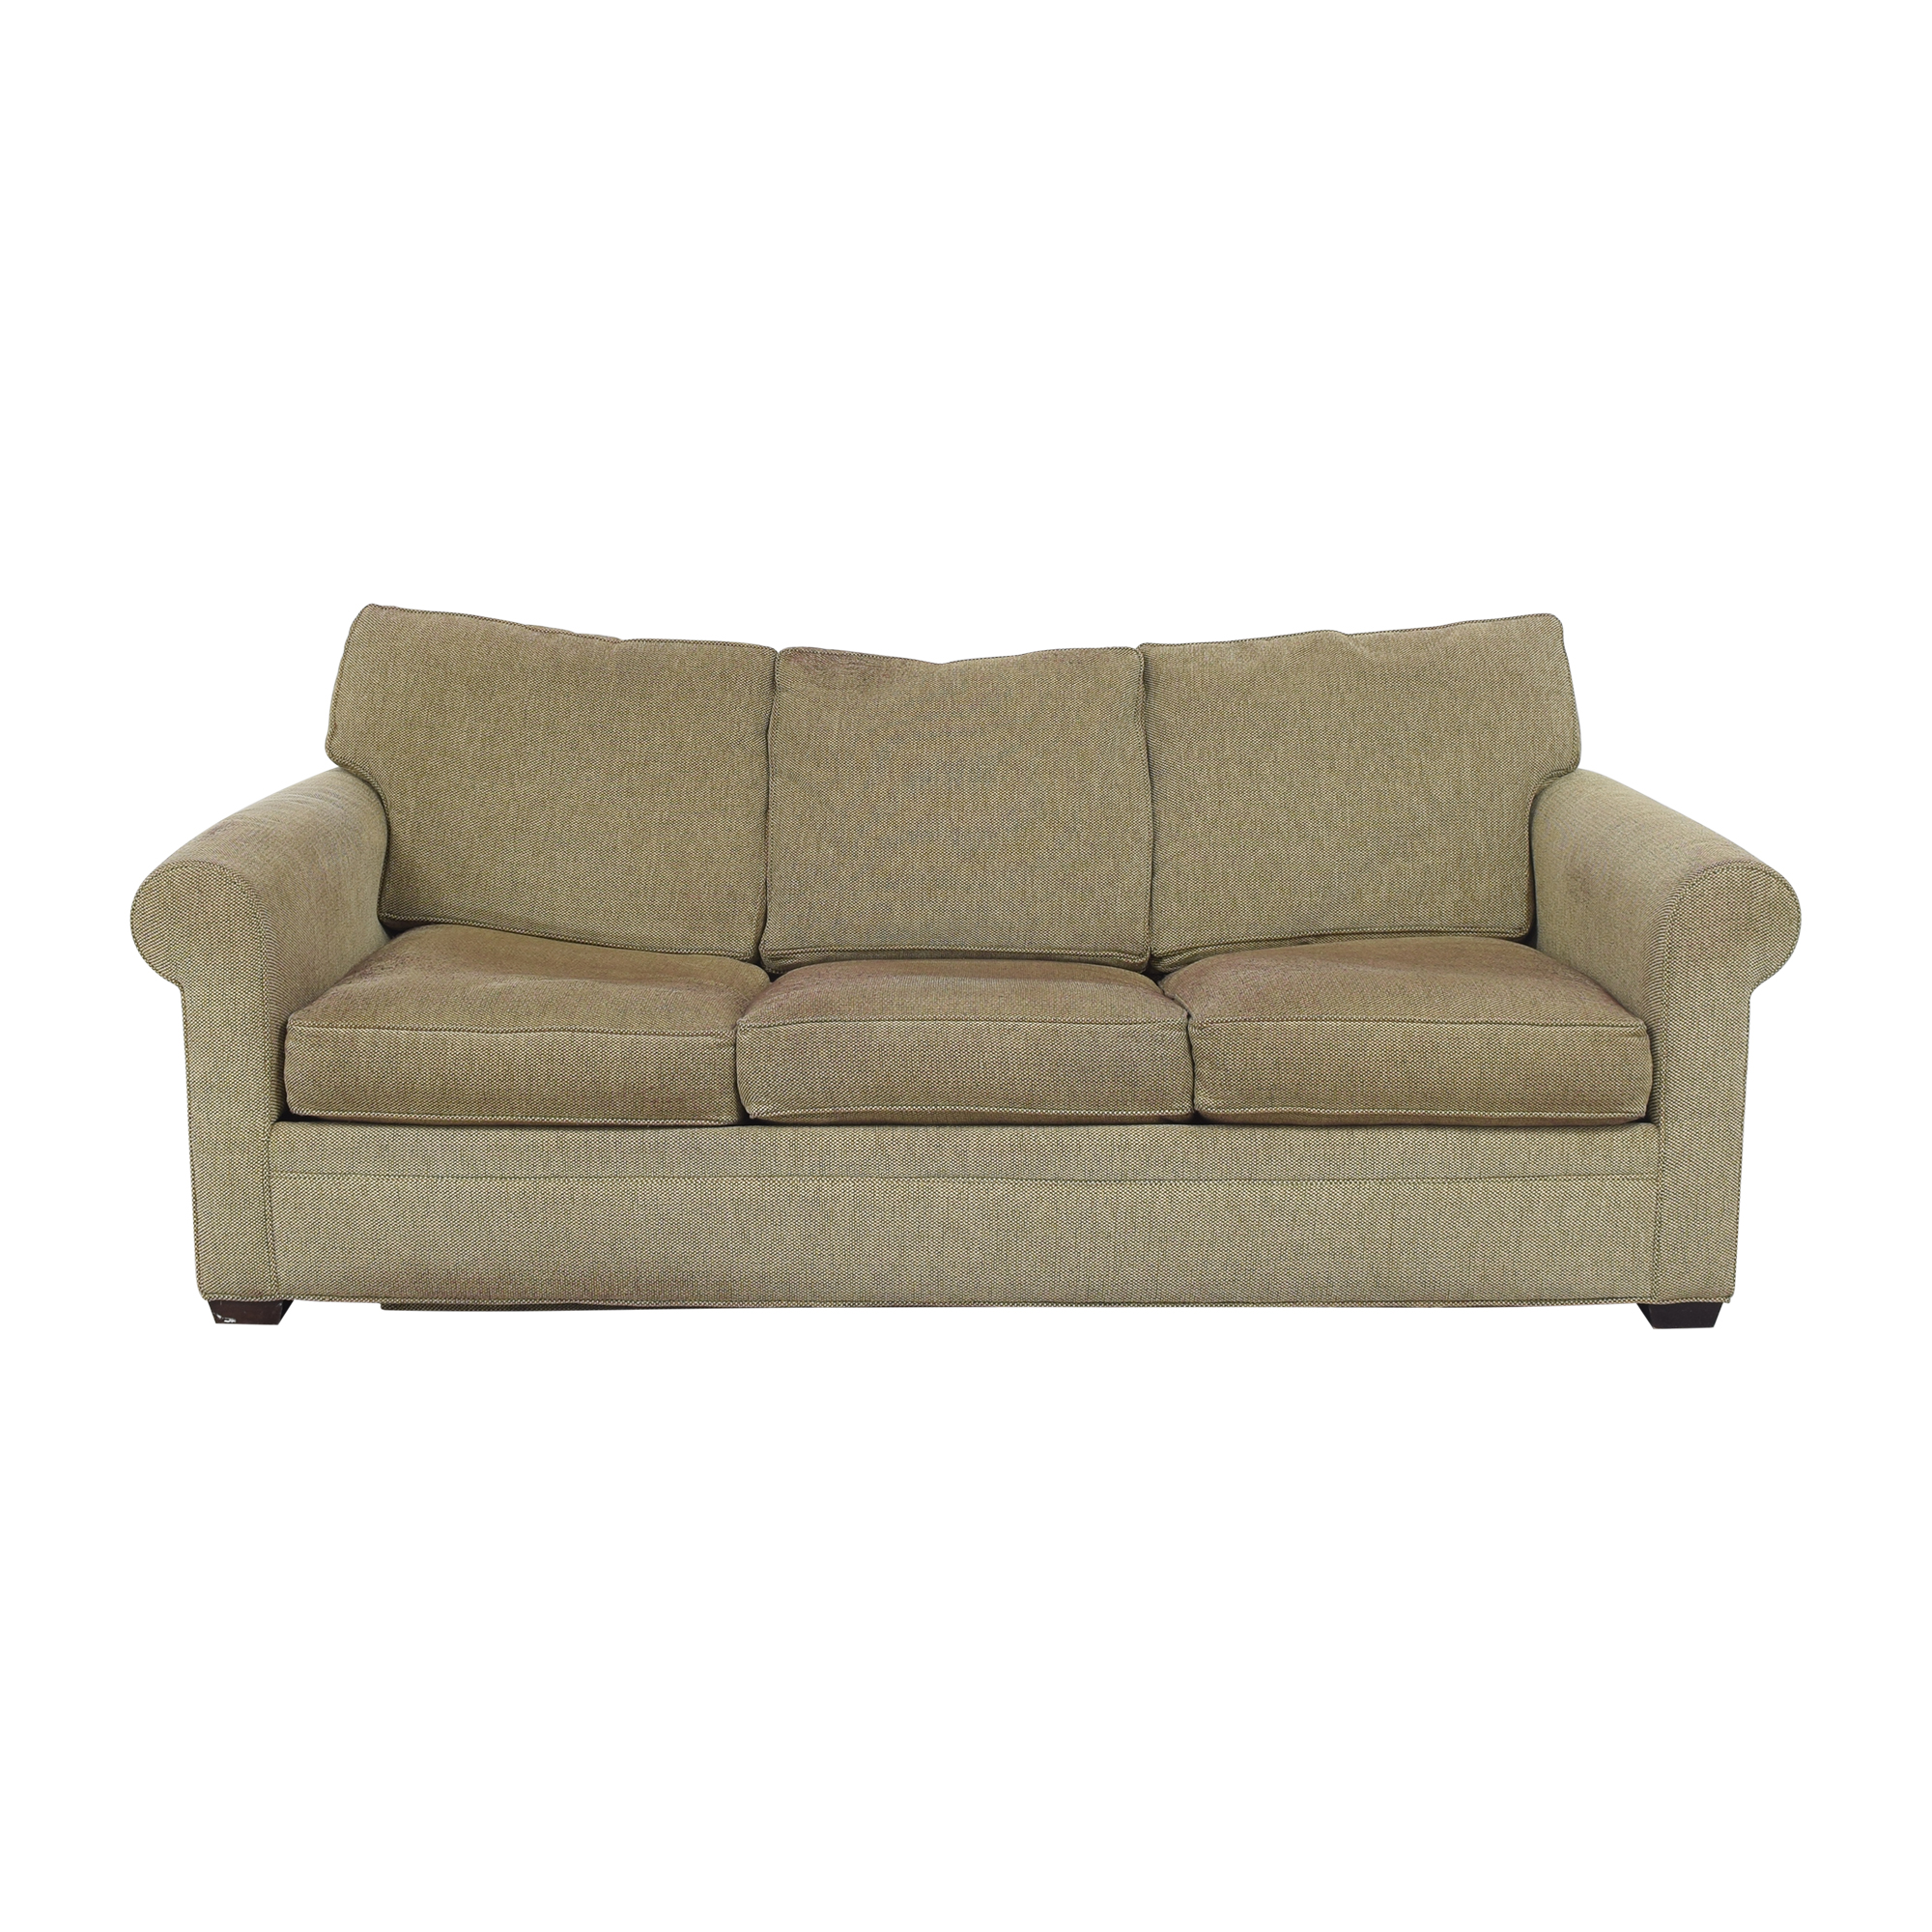 Crate & Barrel Crate & Barrel Three Cushion Sleeper Sofa for sale